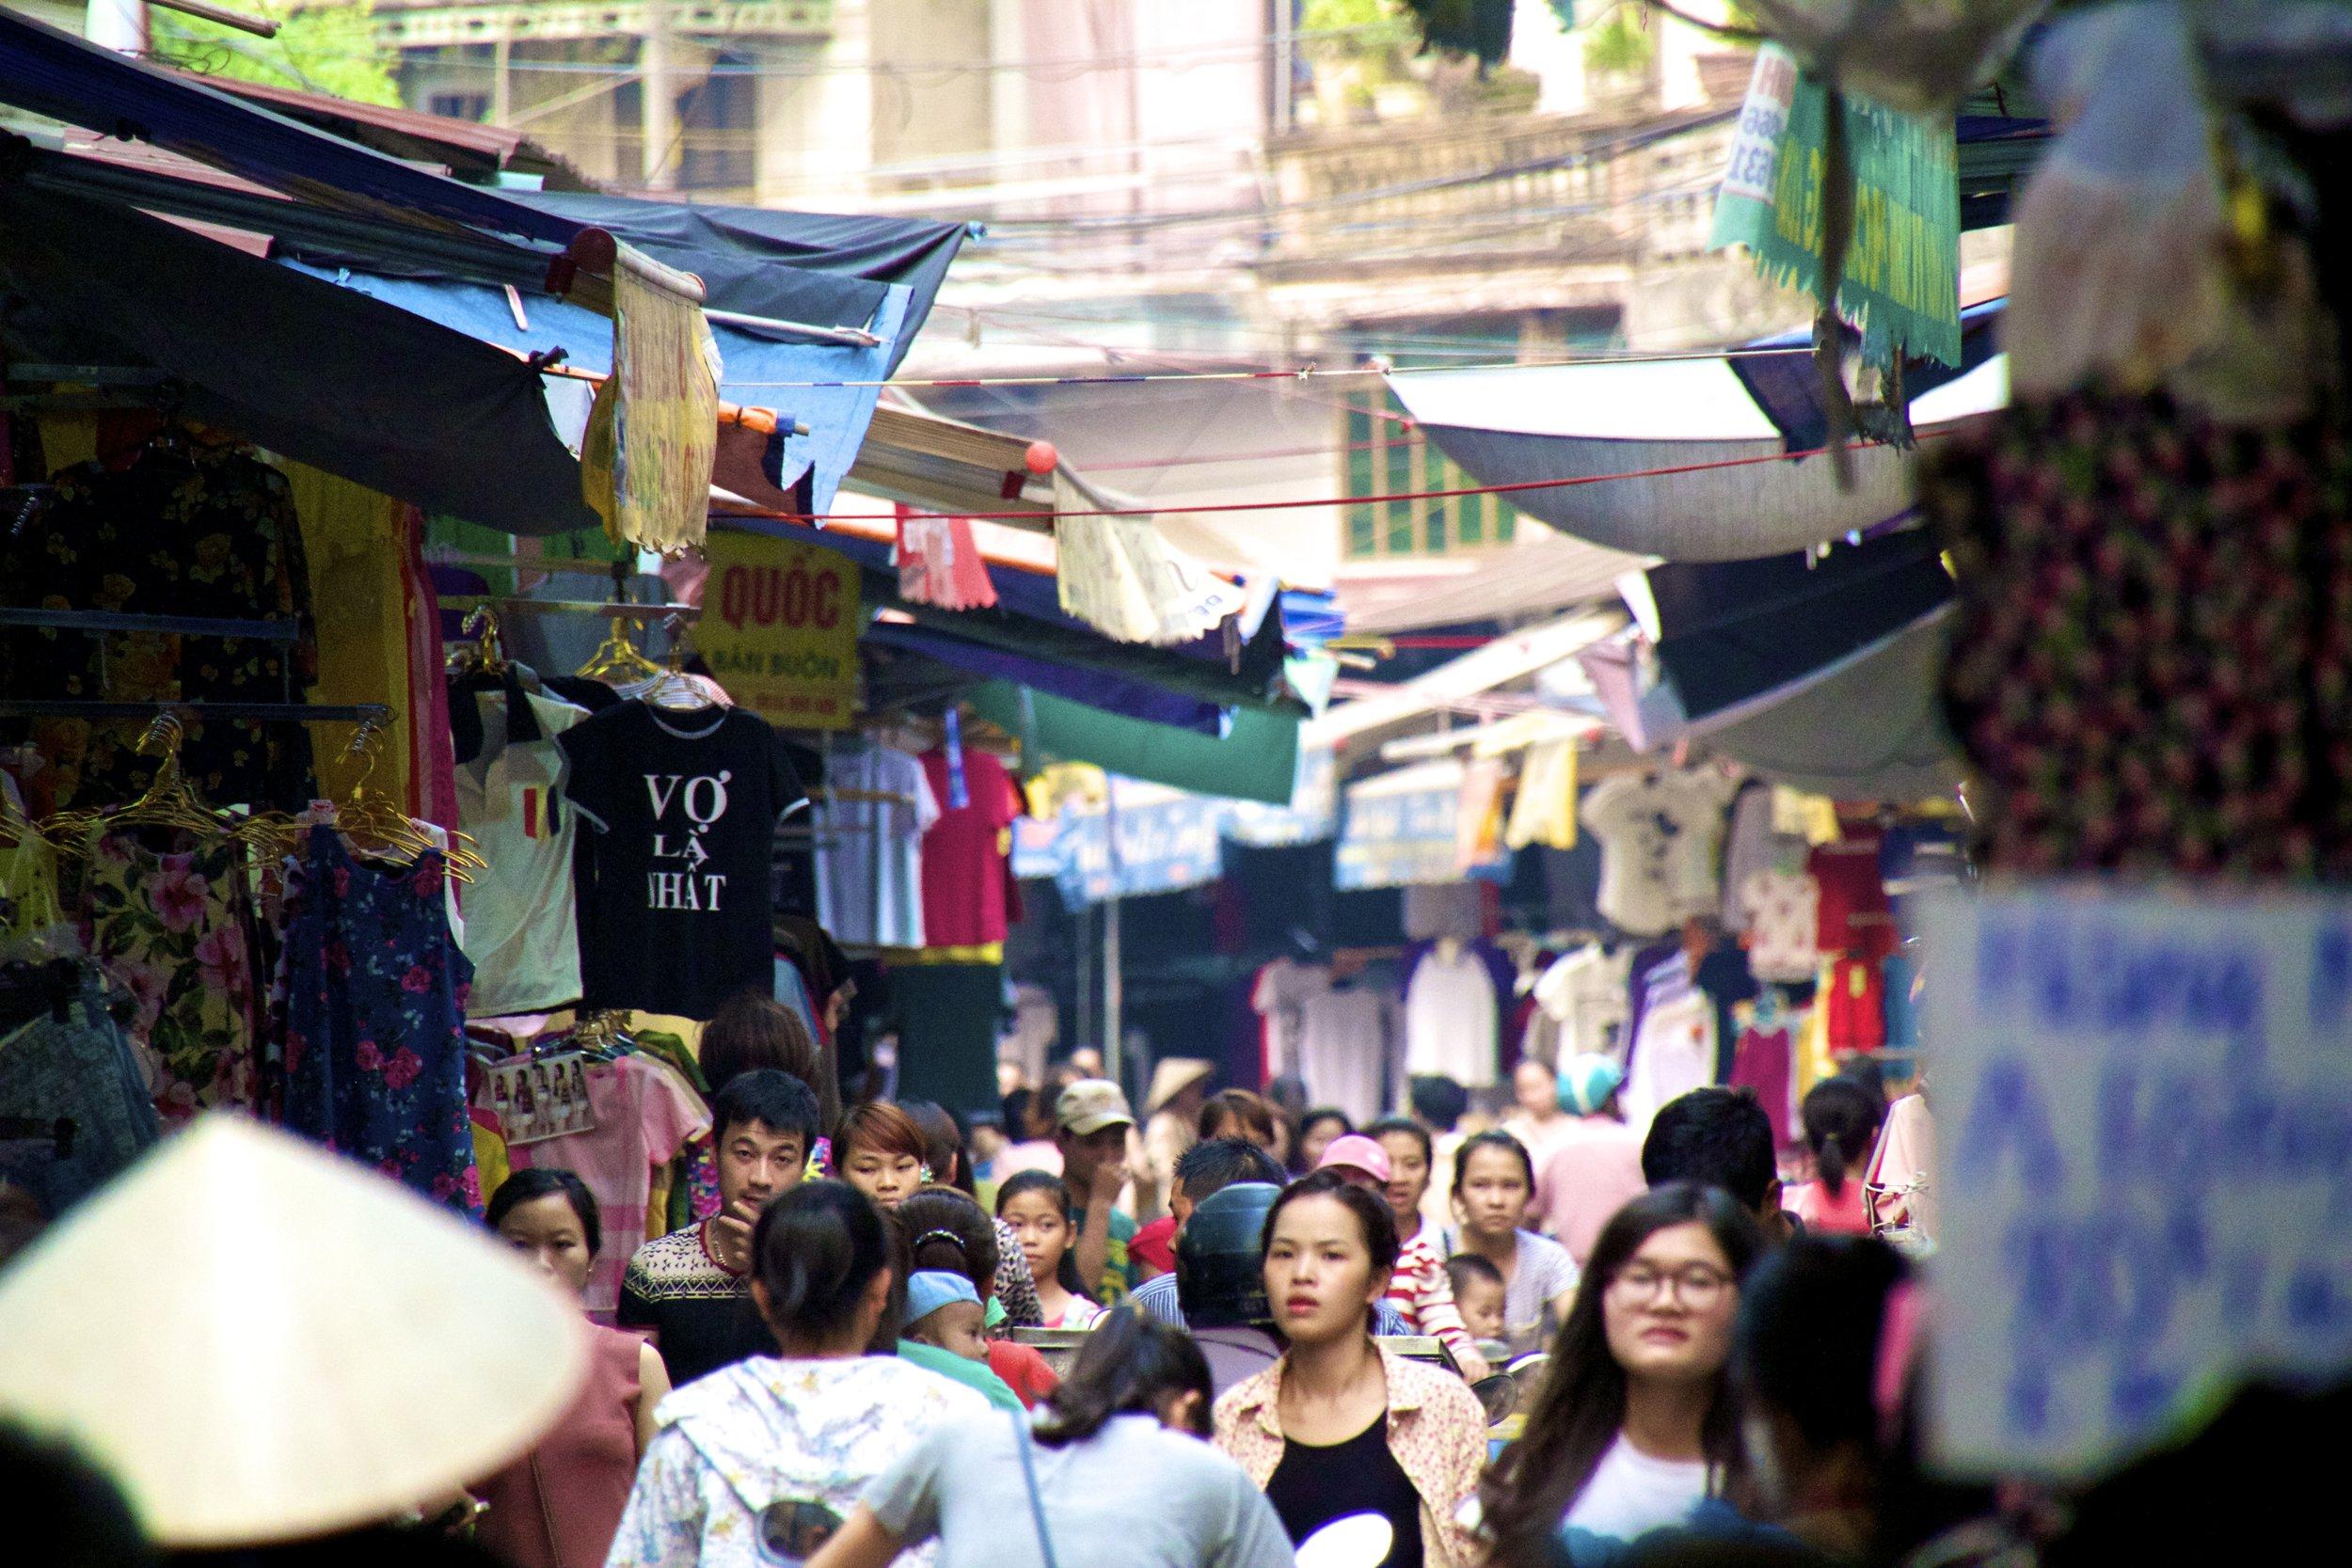 Bac Ninh Vietnam clothes market 3.jpg